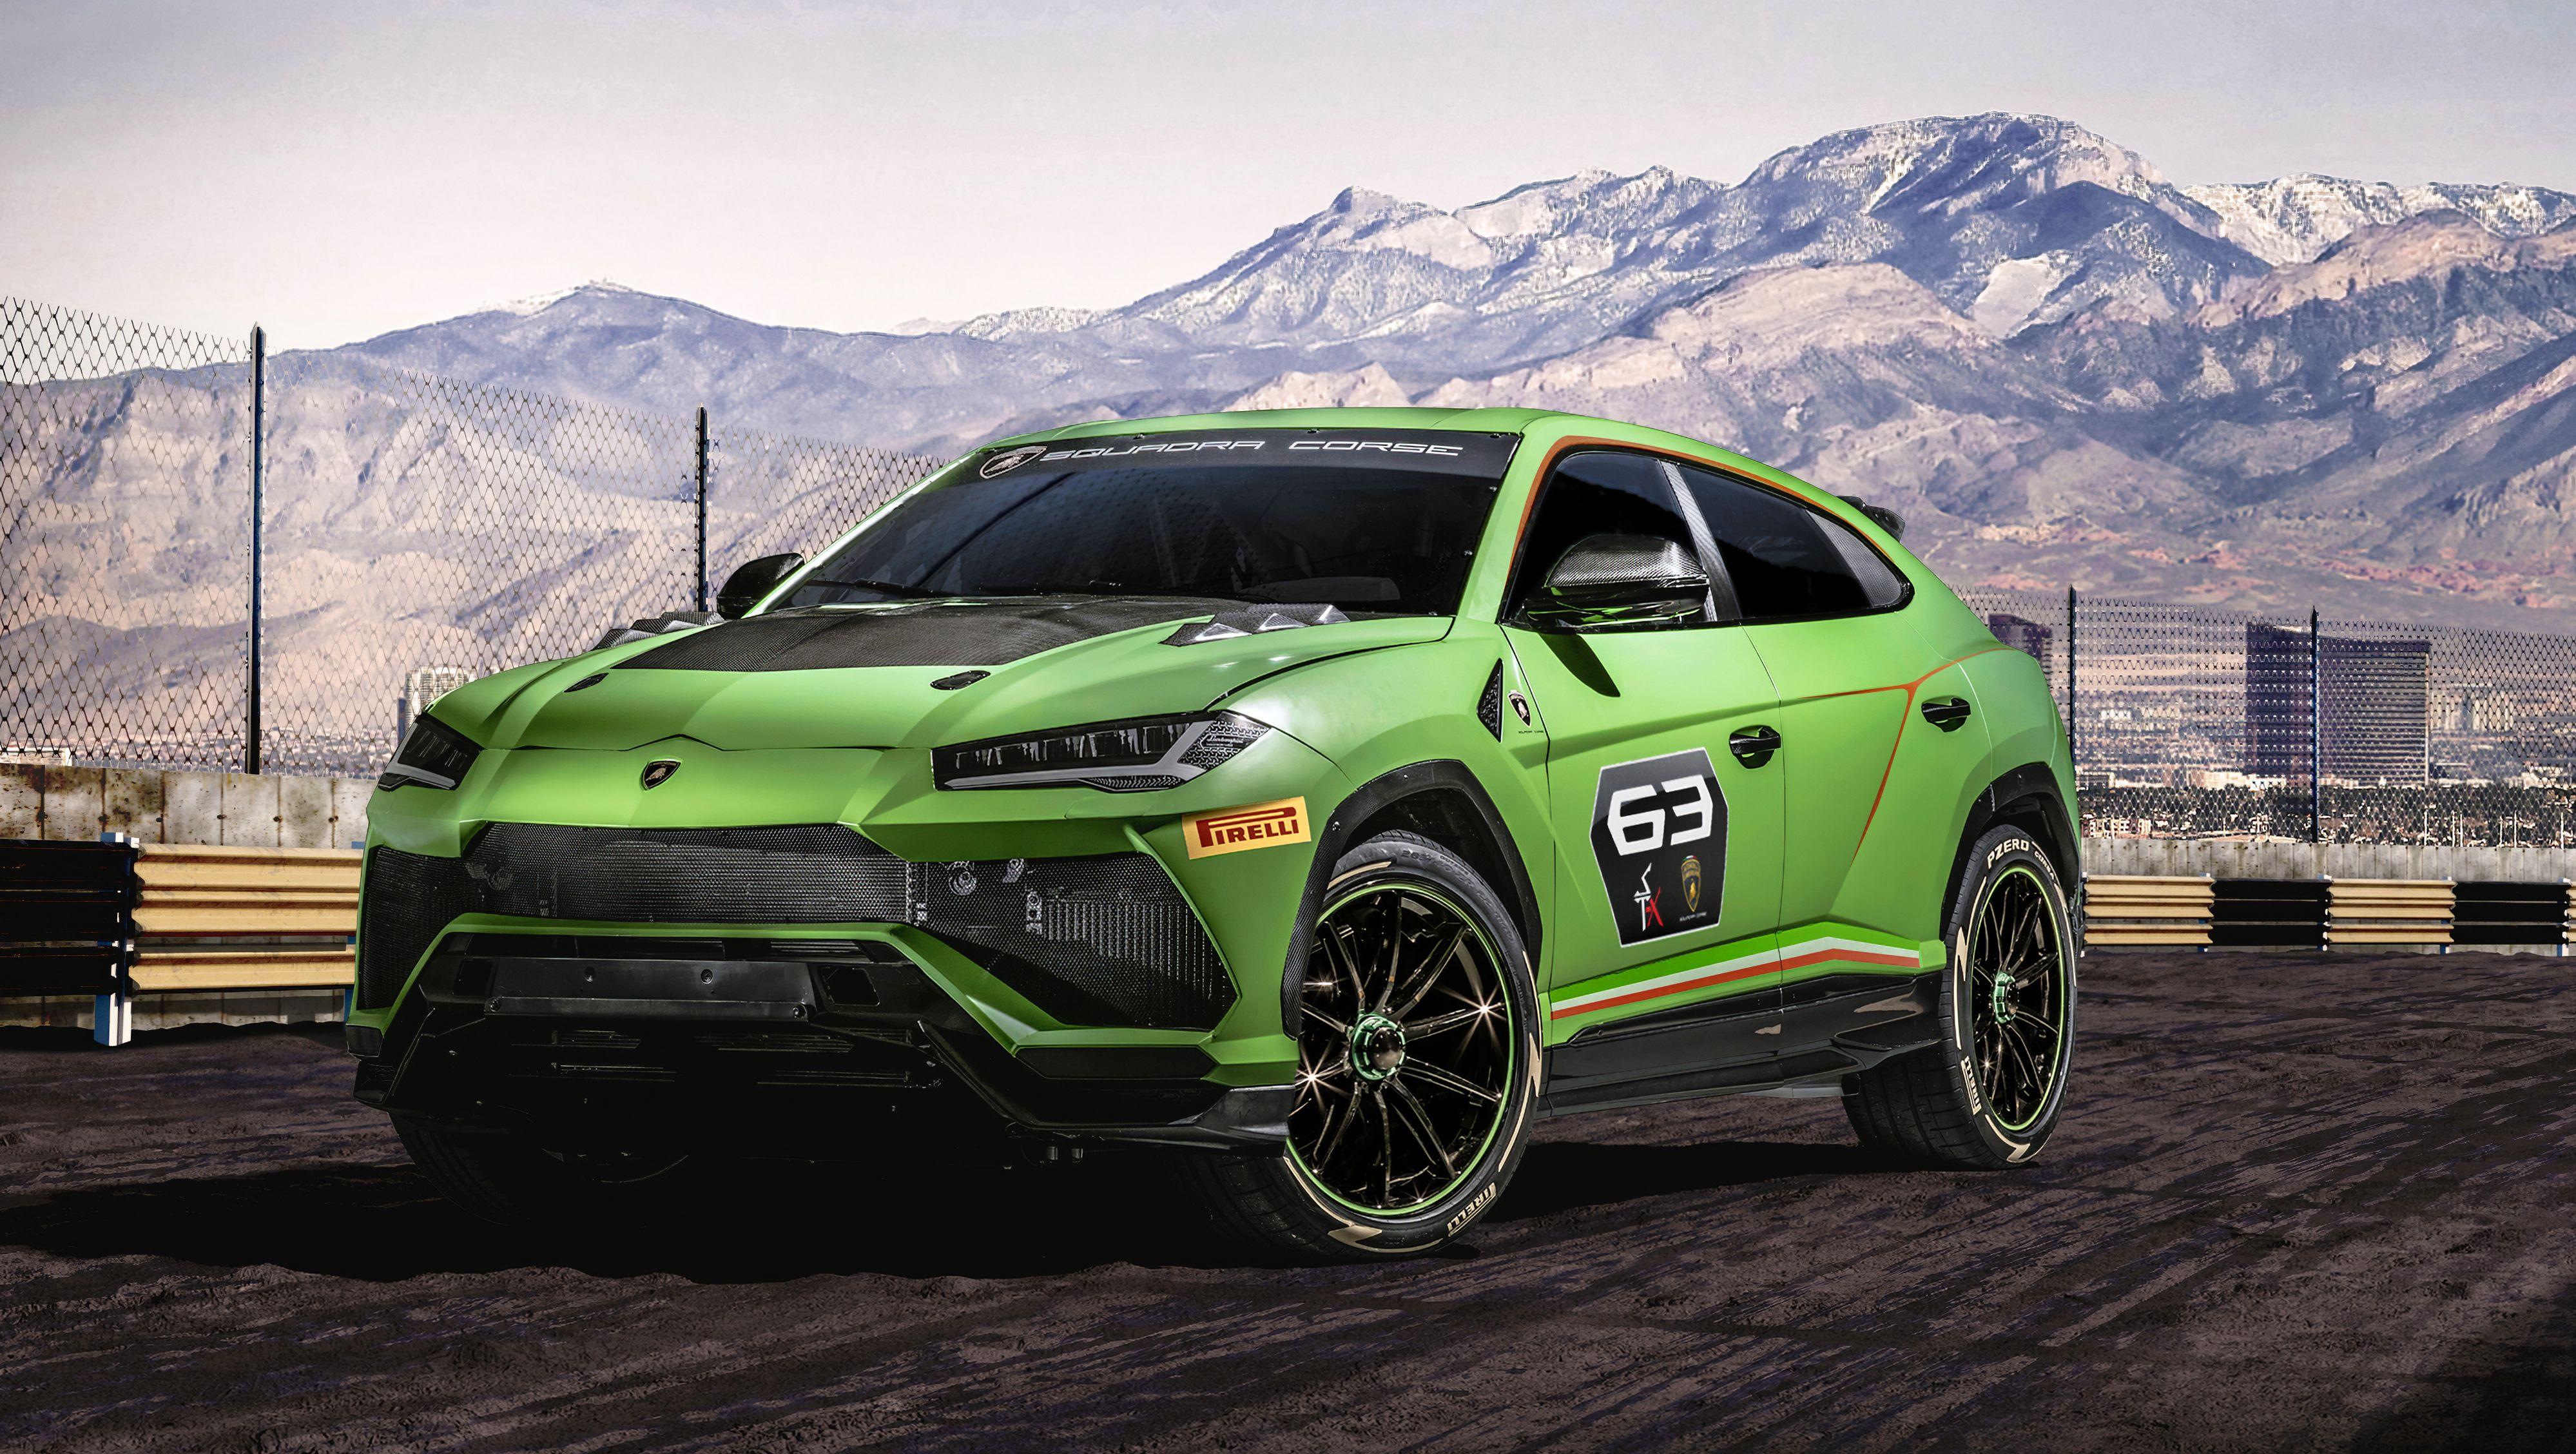 2020 Lamborghini Urus St X Concept Top Speed Suv Lamborghini Super Cars